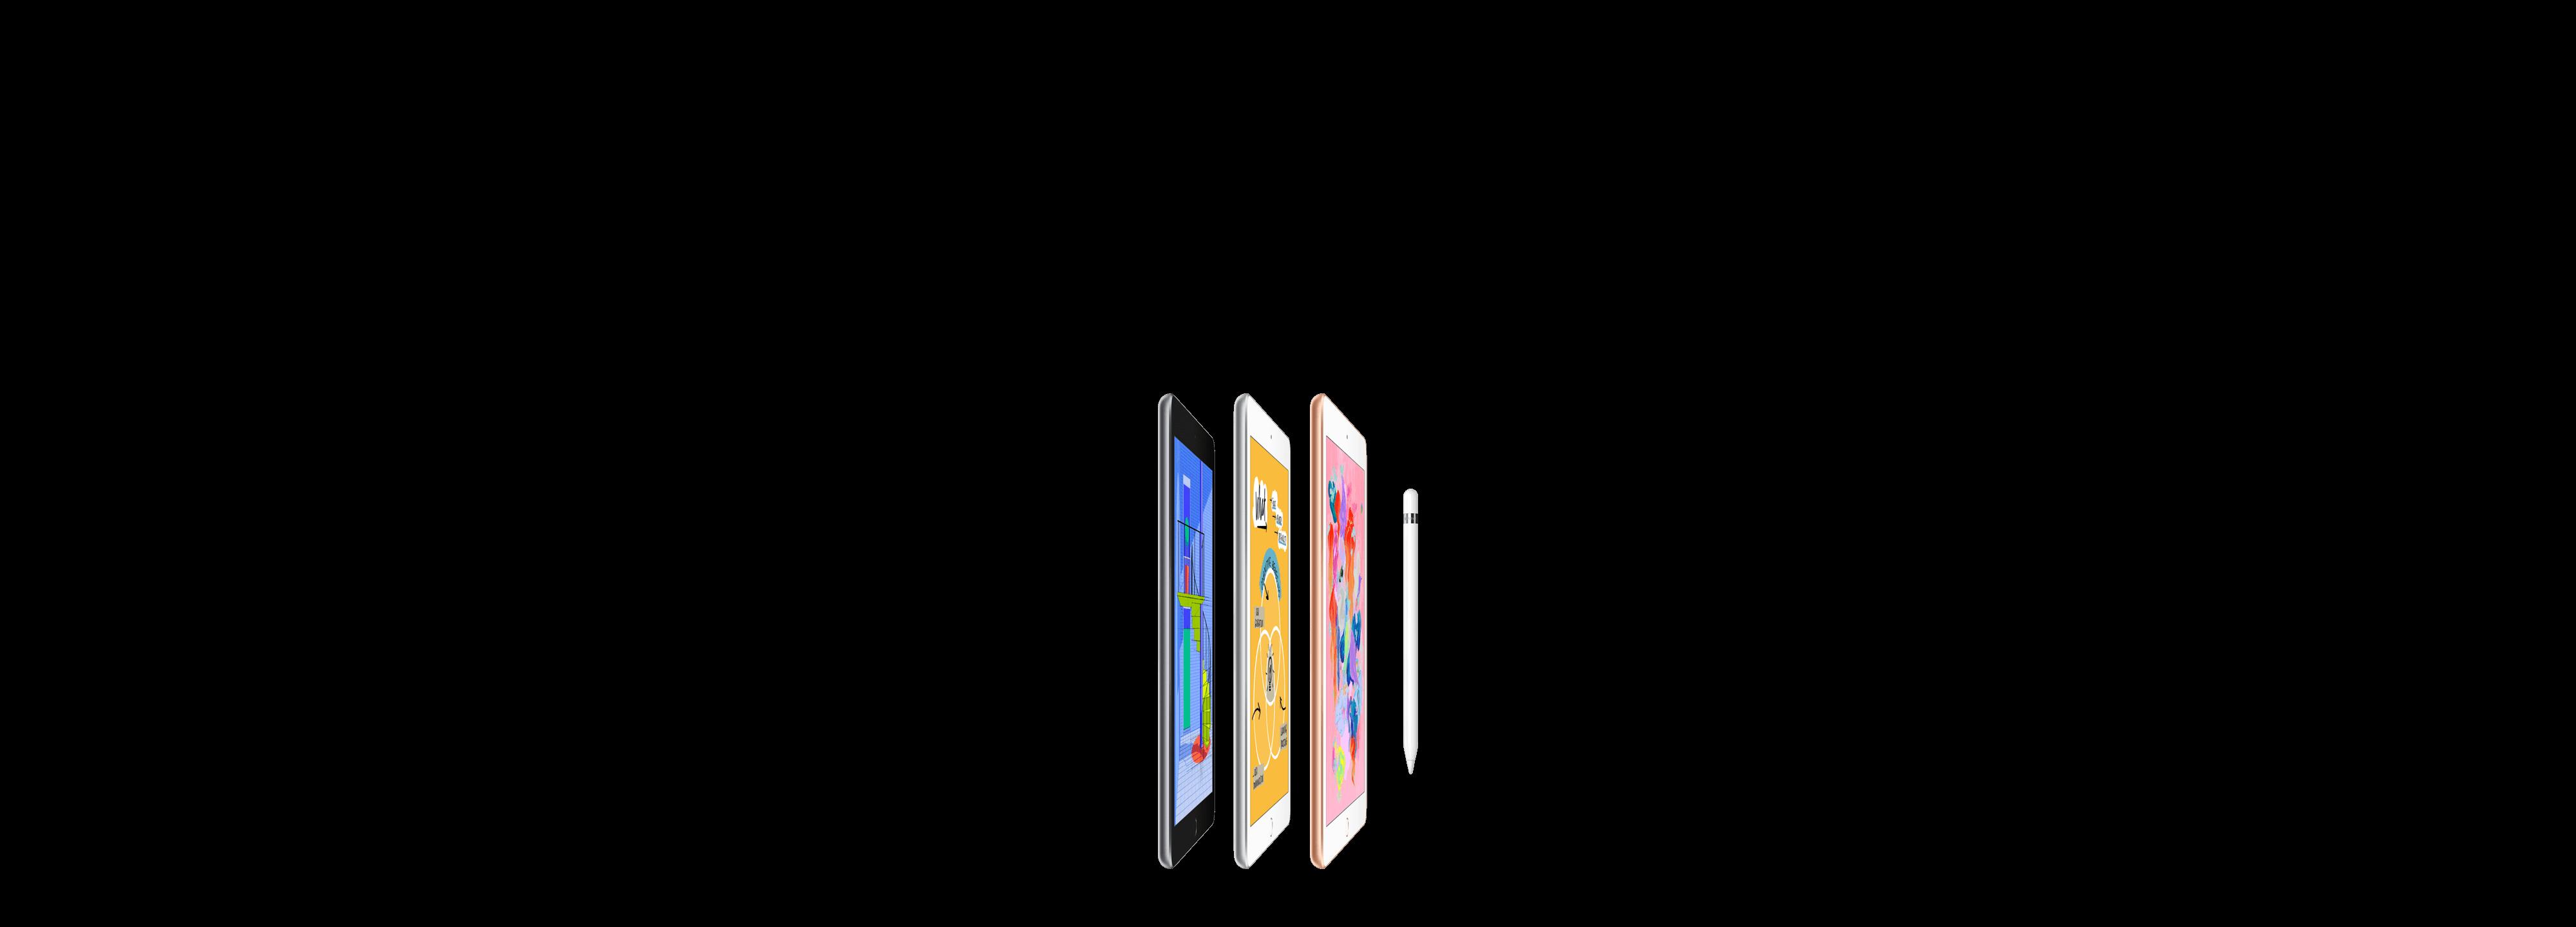 New iPad 2018